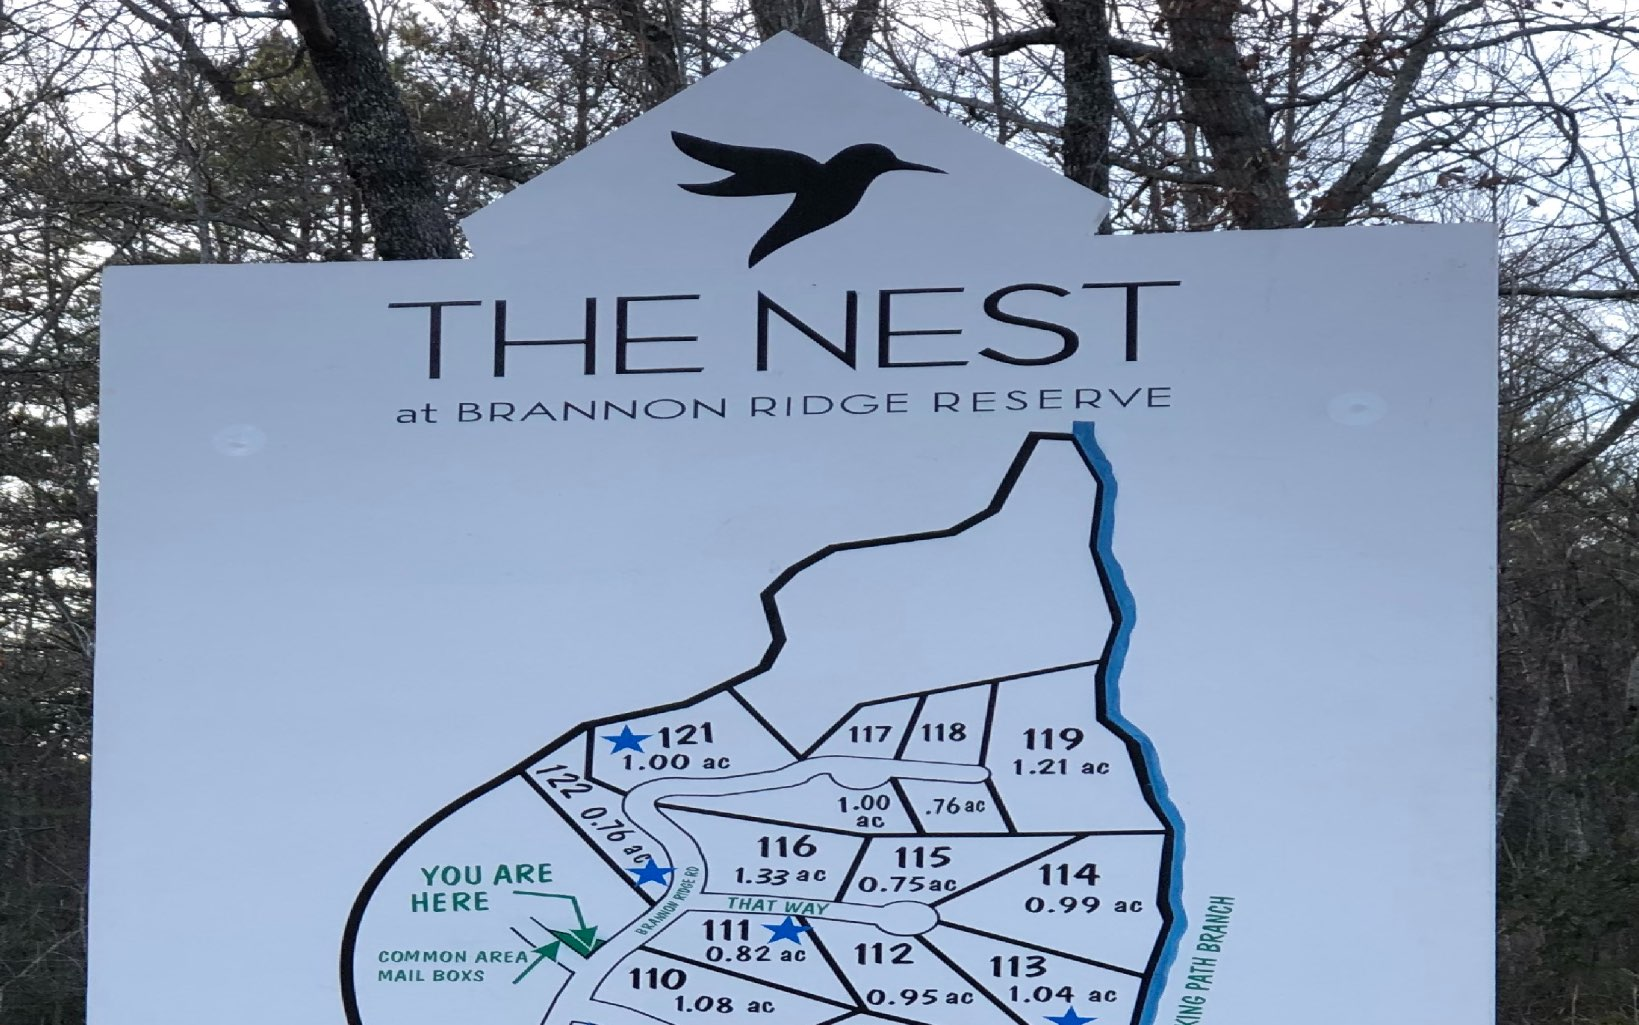 THE NEST LOT 110